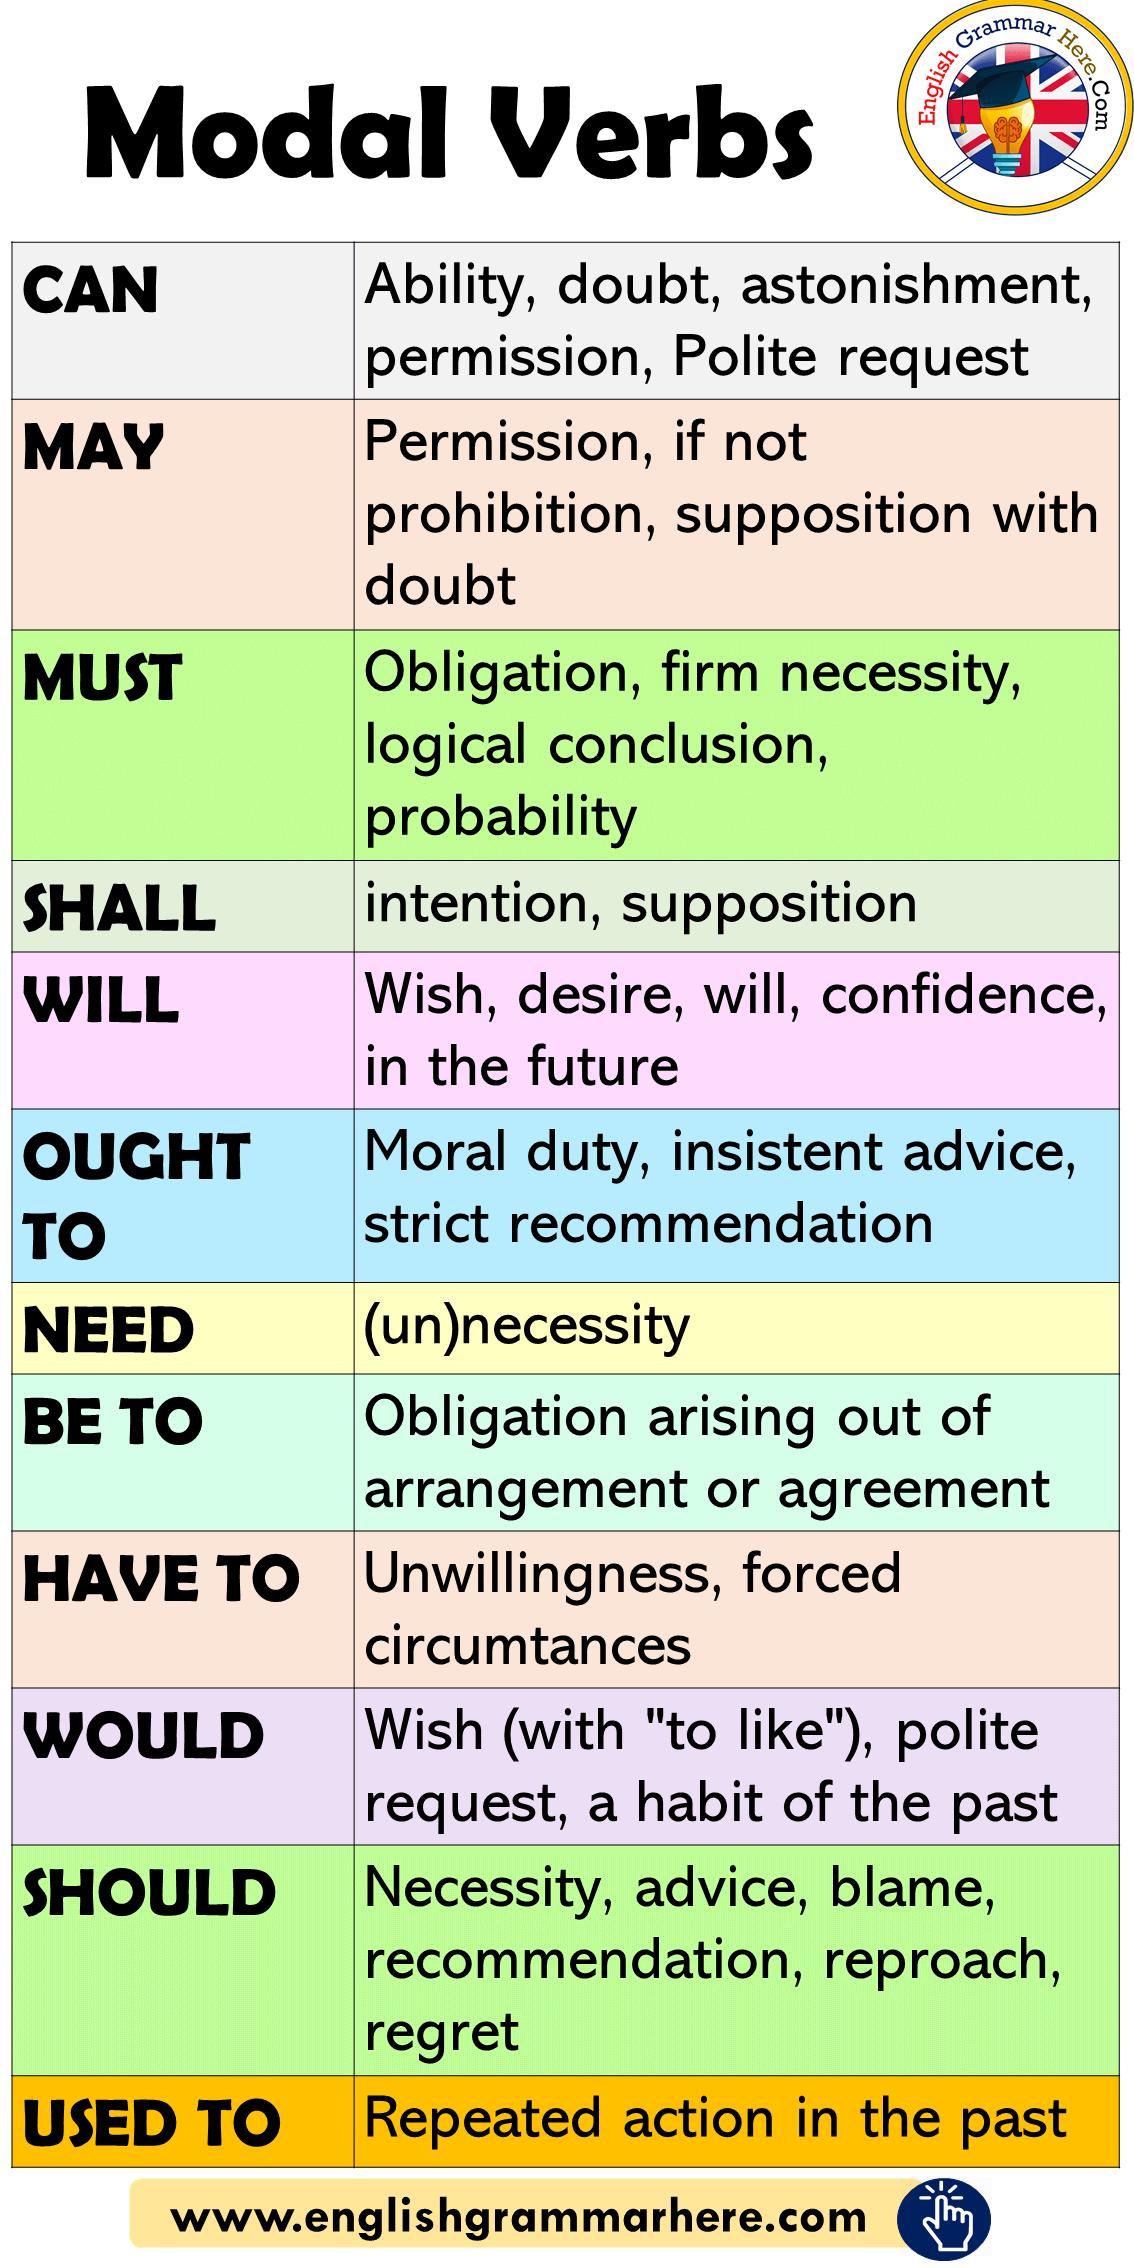 Modal Verbs in English, How to Use Modals (с изображениями) | Учебные плакаты, Грамматические уроки, Грамматические упражнения